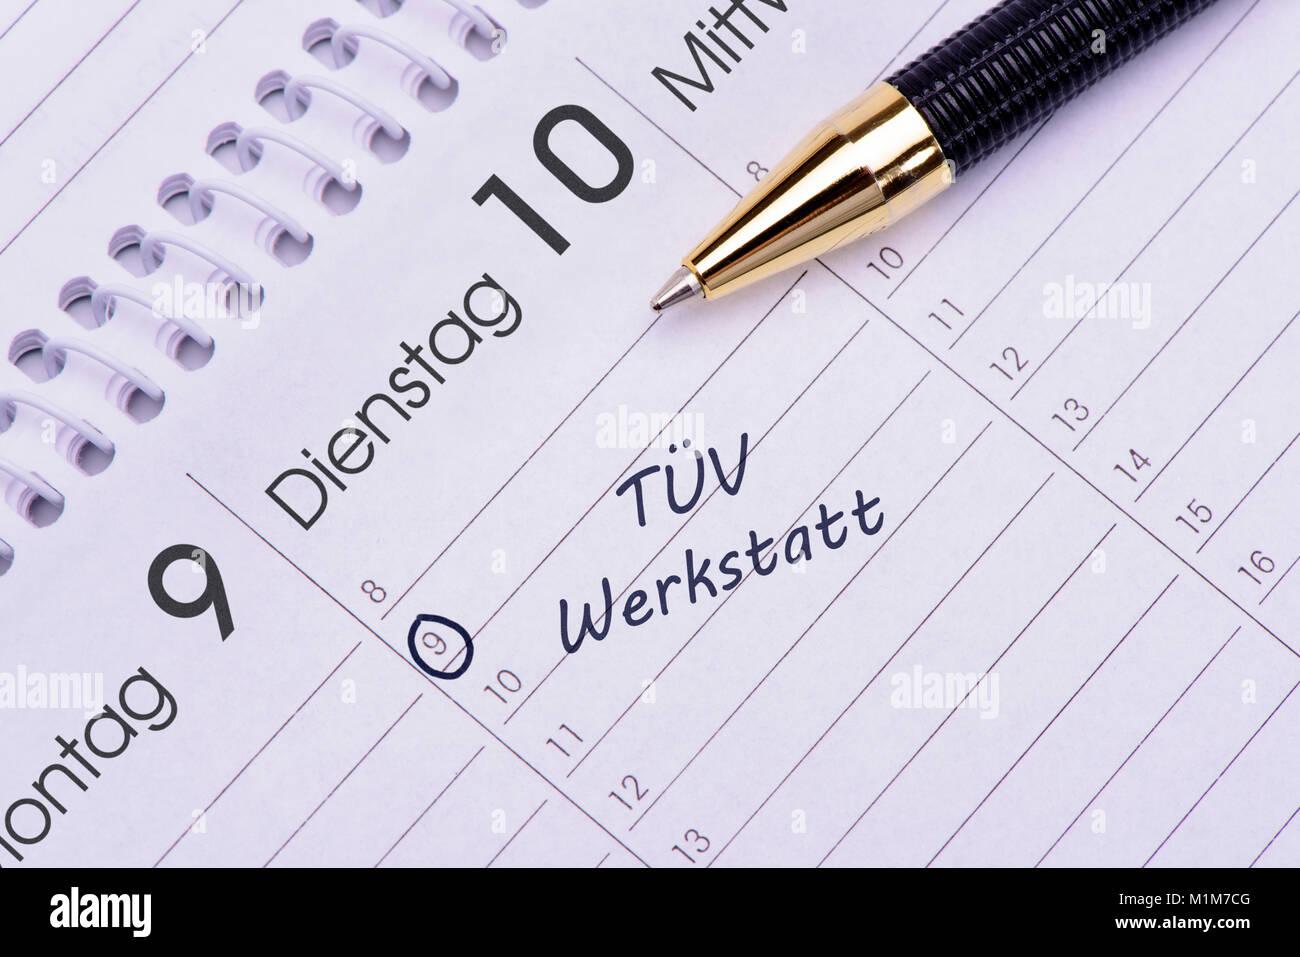 Kalendereintrag für TÜV - Stock Image